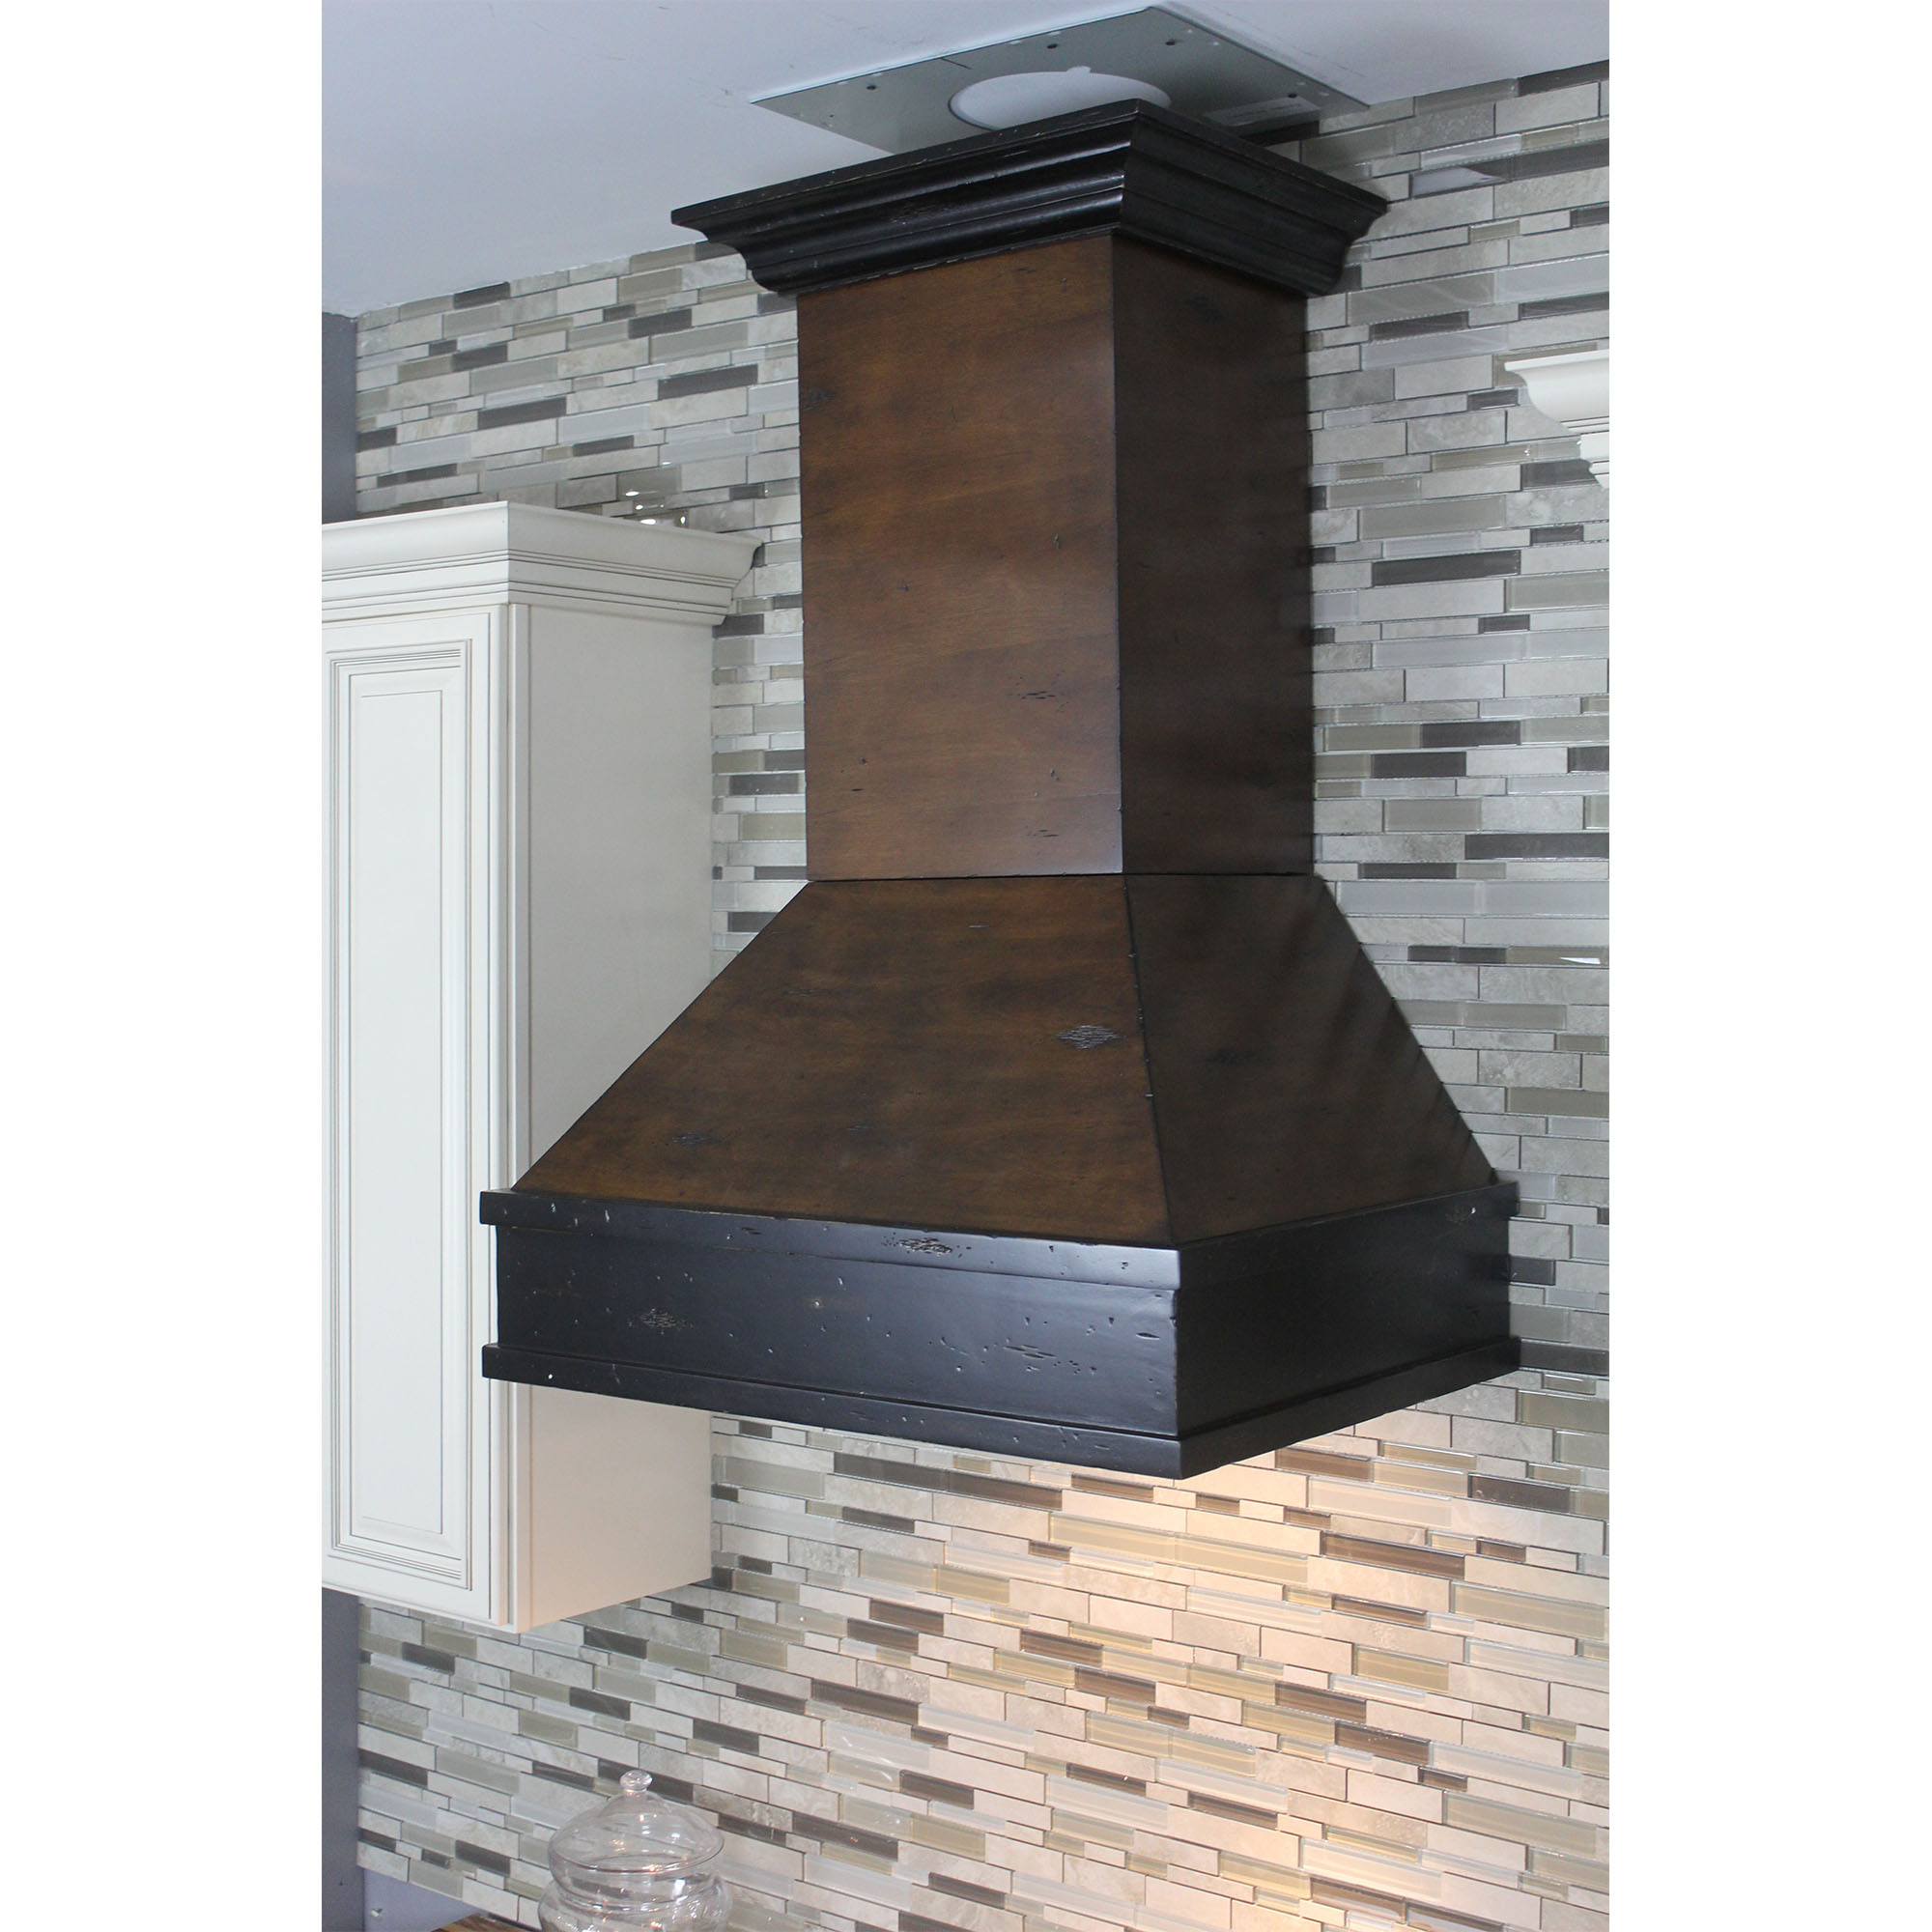 custom-wood-range-hood-zline-329AH-kitchen-side-zline.jpg